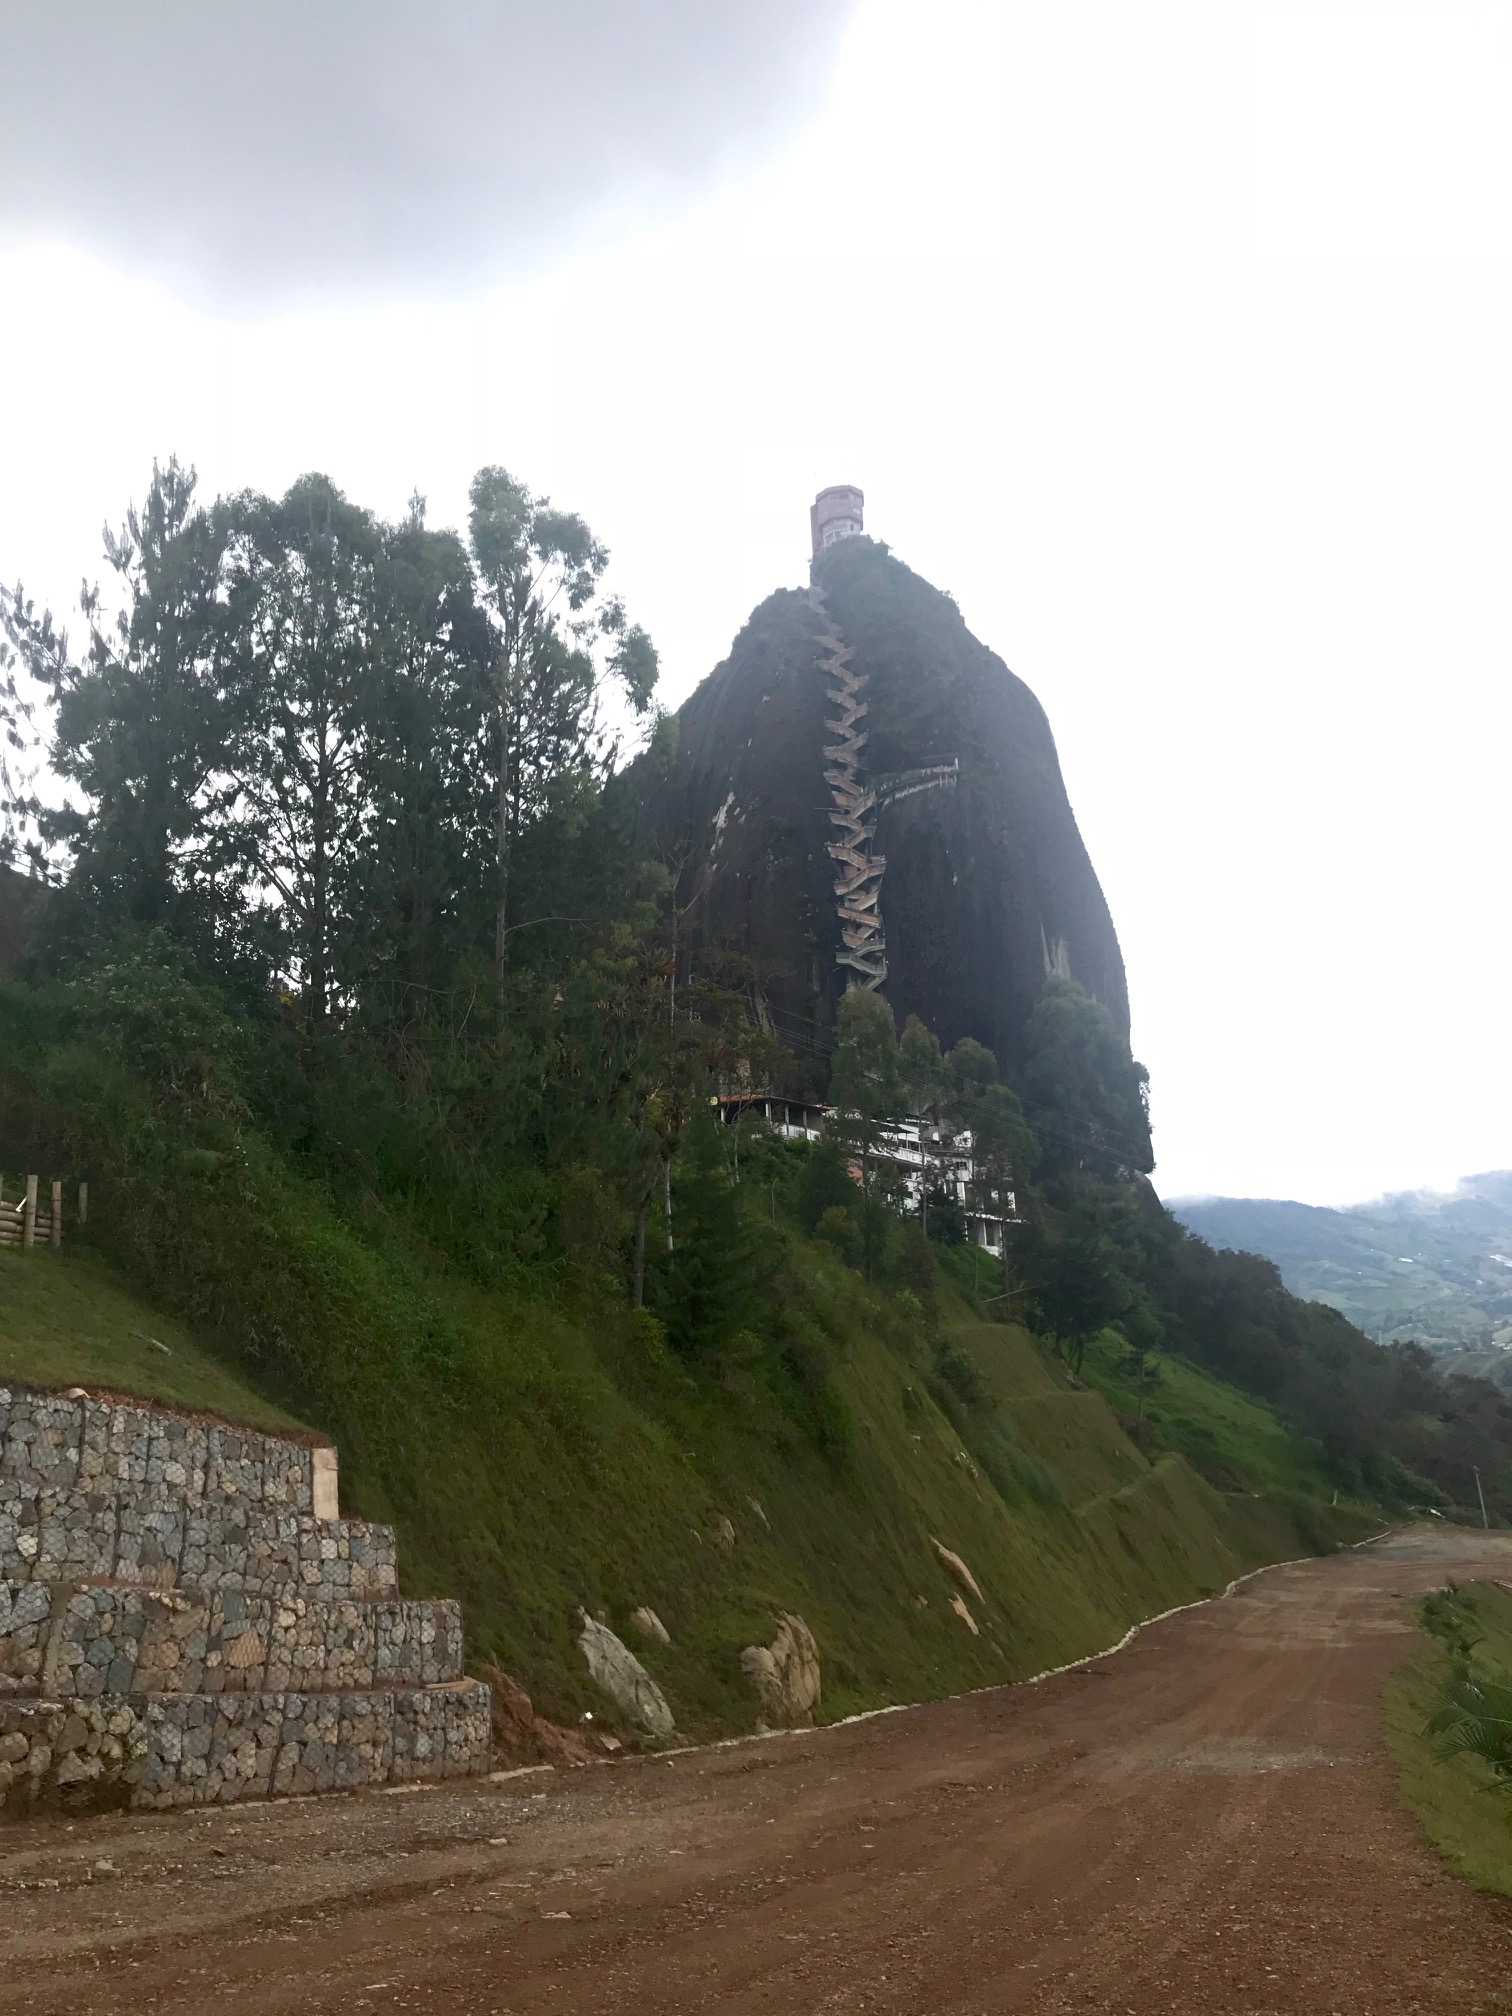 View of La Piedra